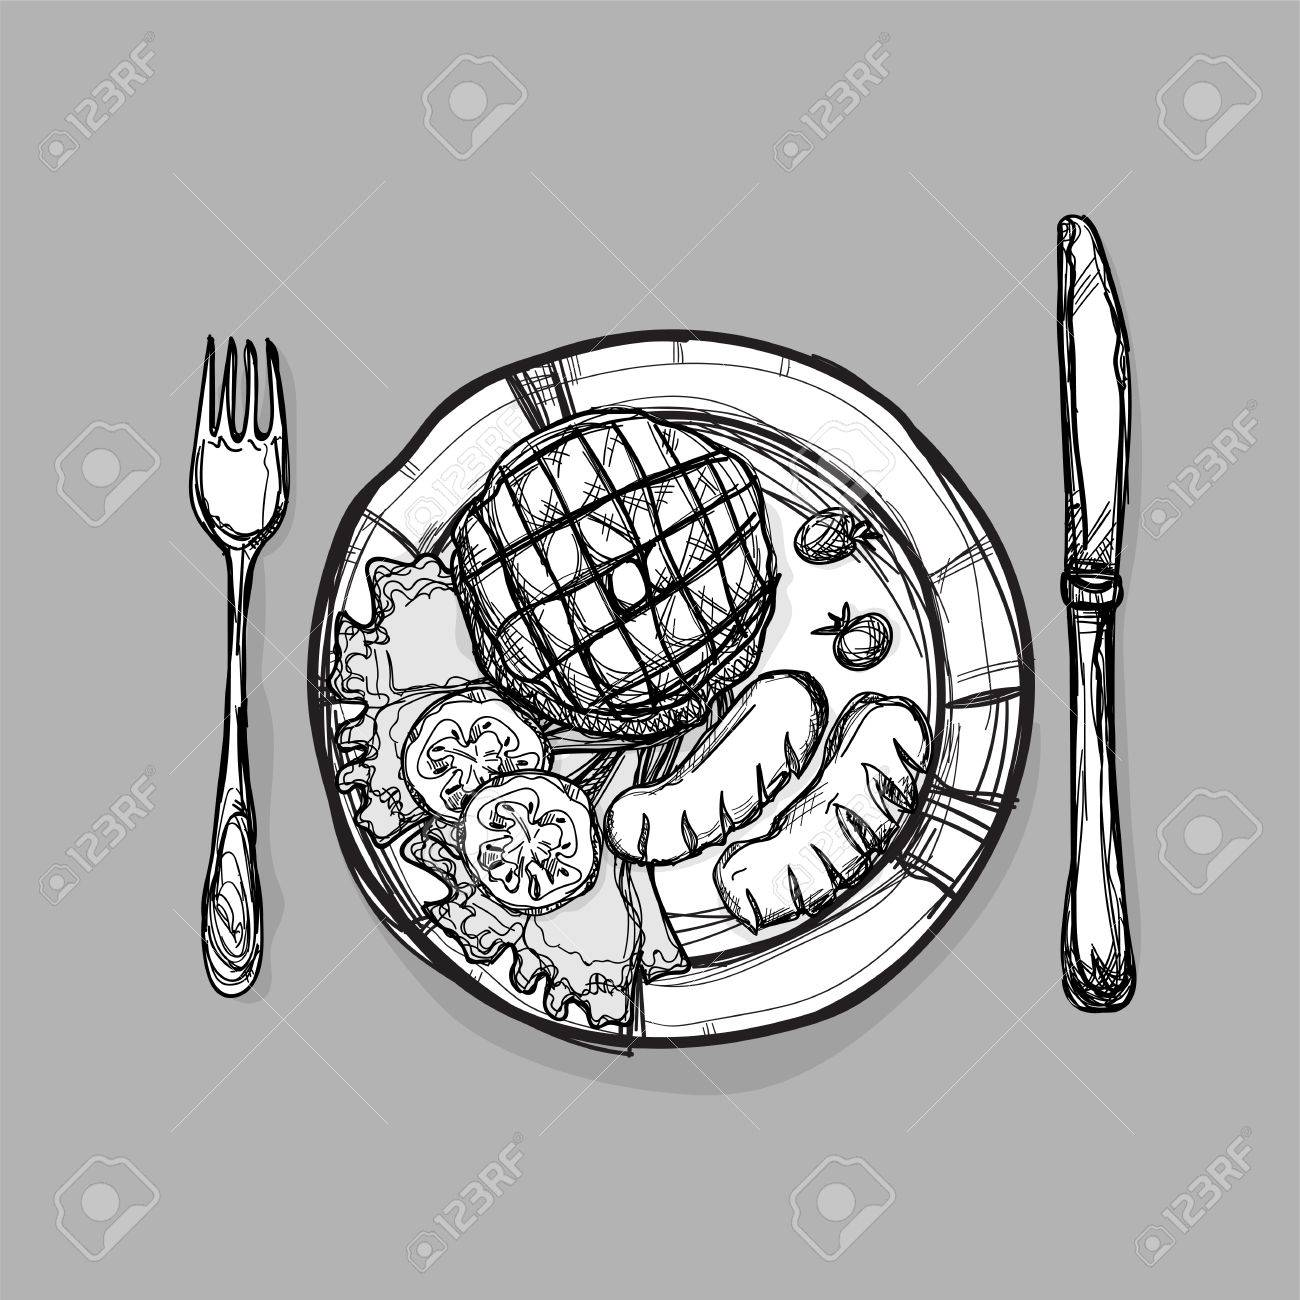 1300x1300 Food Steak Meat Burger Sausage Set Drawing Graphic Illustrate